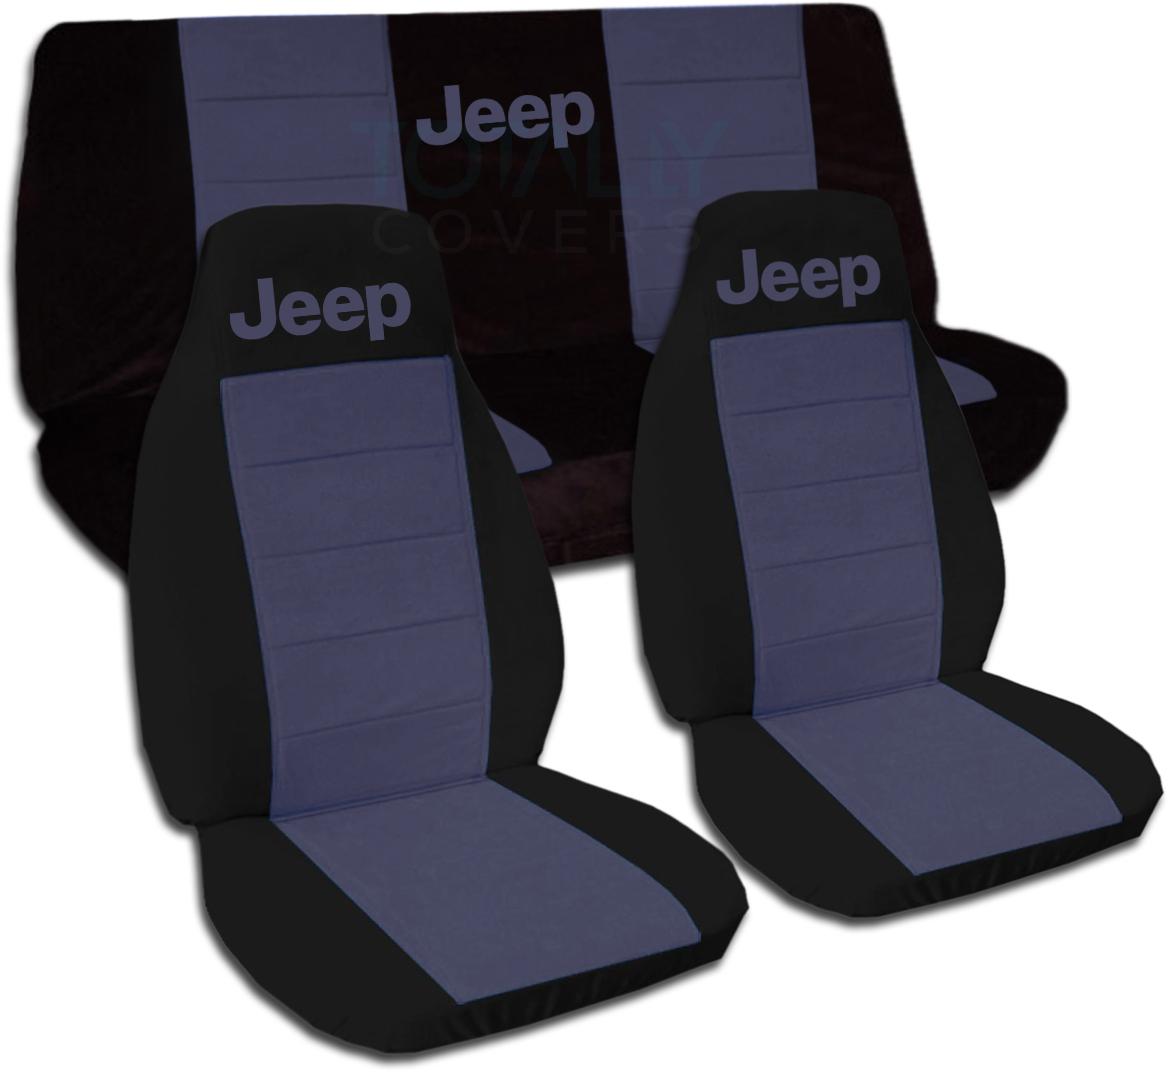 Jeep Wrangler Yj Tj Jk 1987 2018 Two Tone Seat Covers W